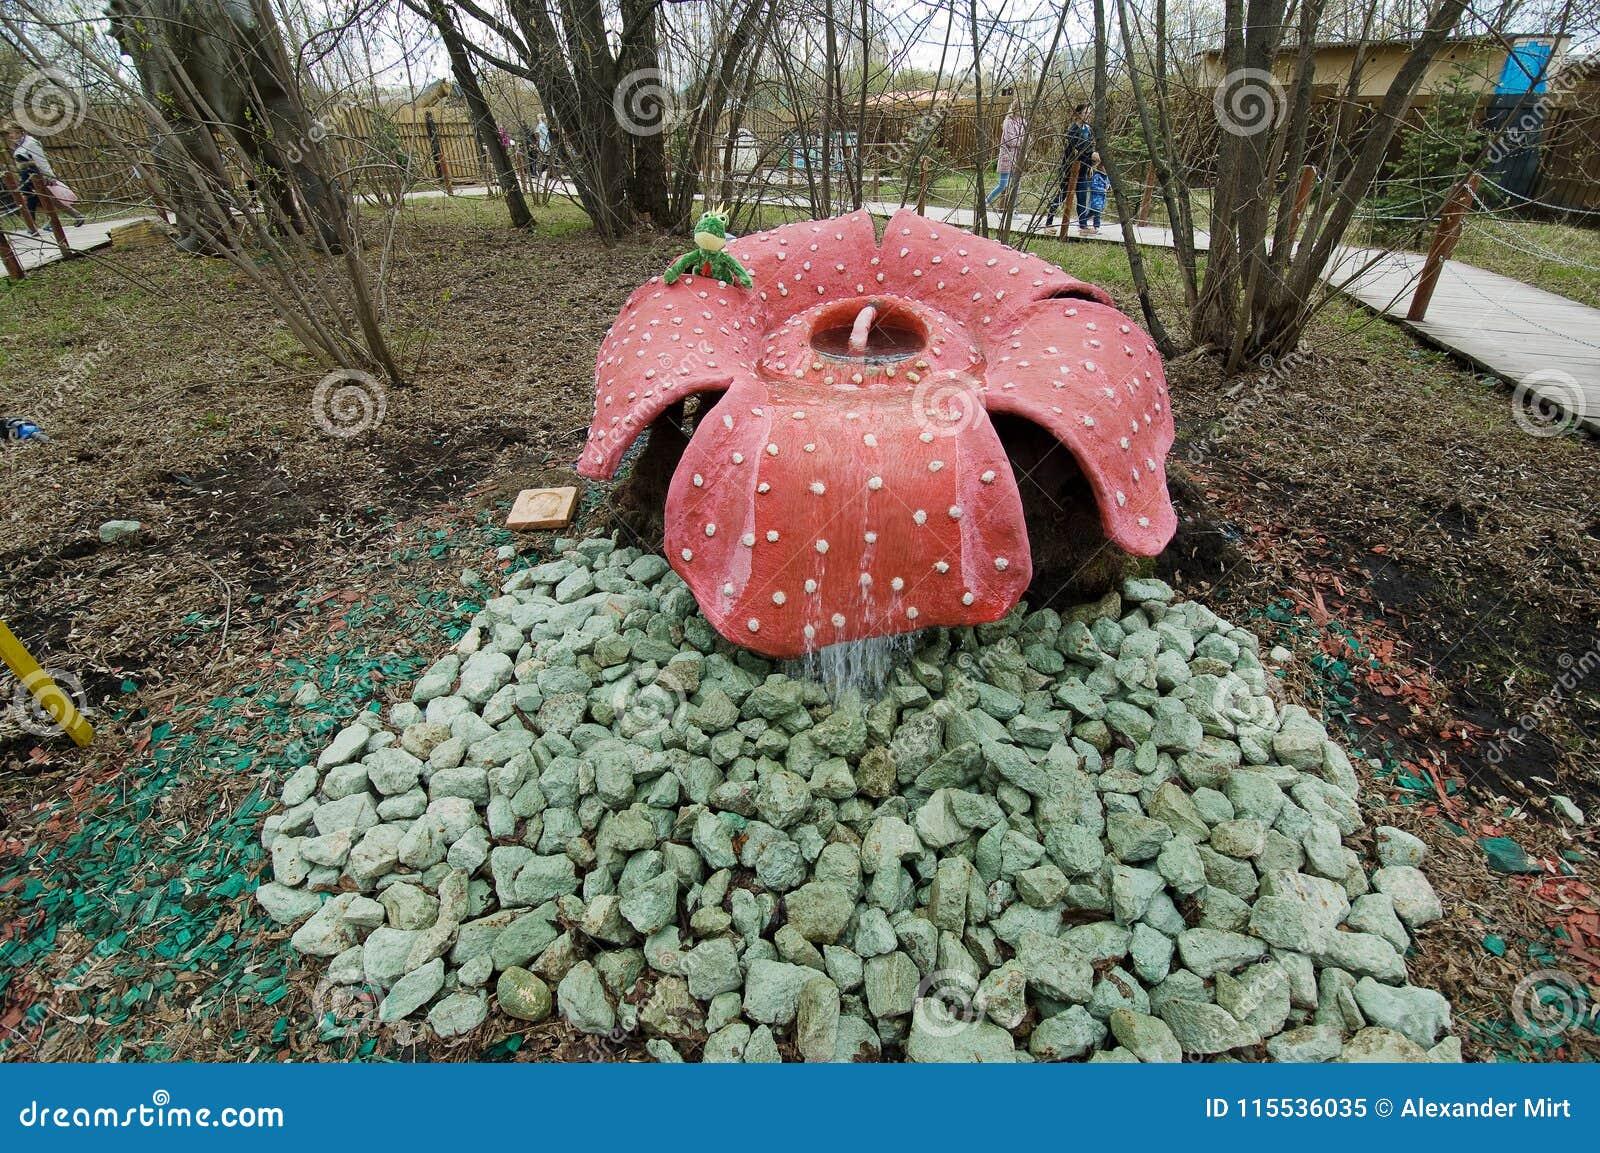 Rafflesia, prehistoric predator flower in Dinosaur Park, Moscow, Russia